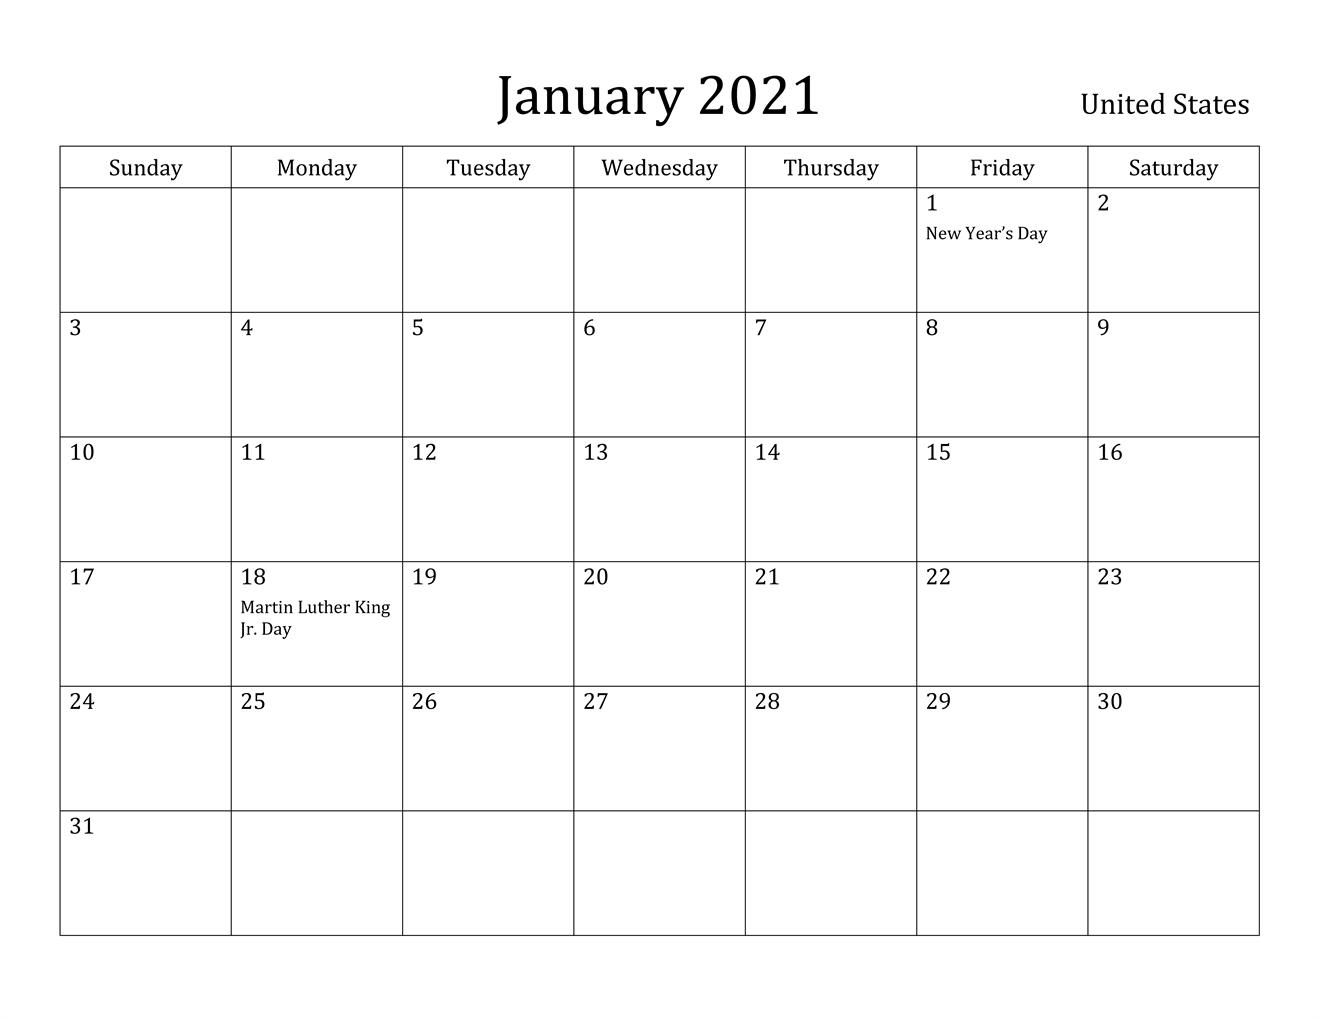 January 2021 Tamil Calendar